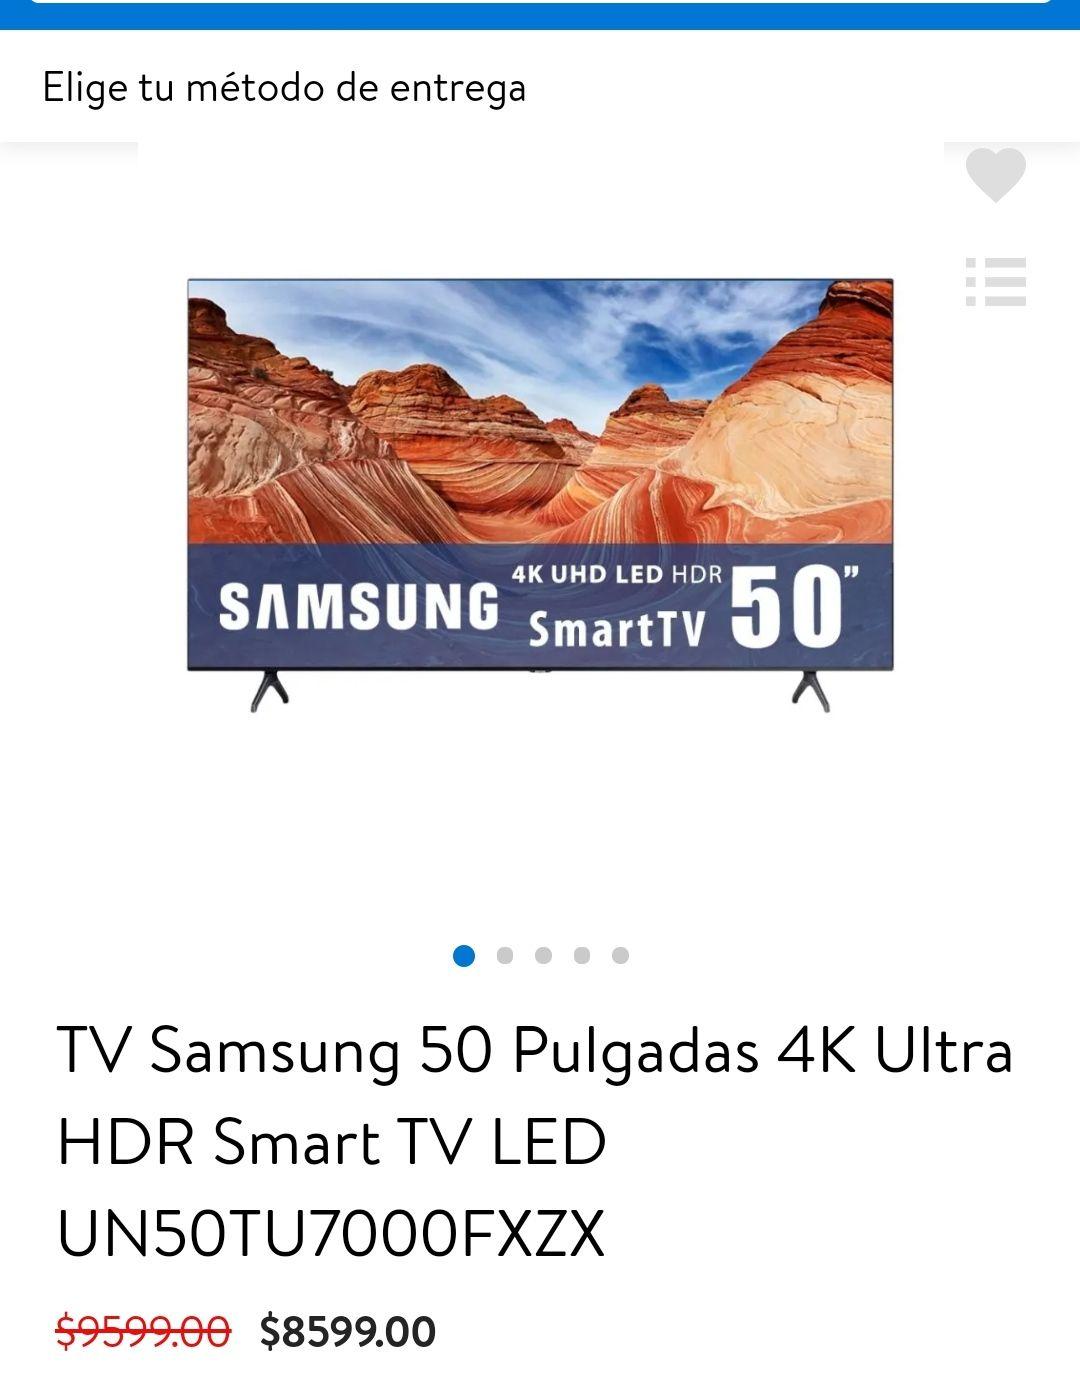 Walmart: TV Samsung 50 Pulgadas 4K Ultra HDR Smart TV LED